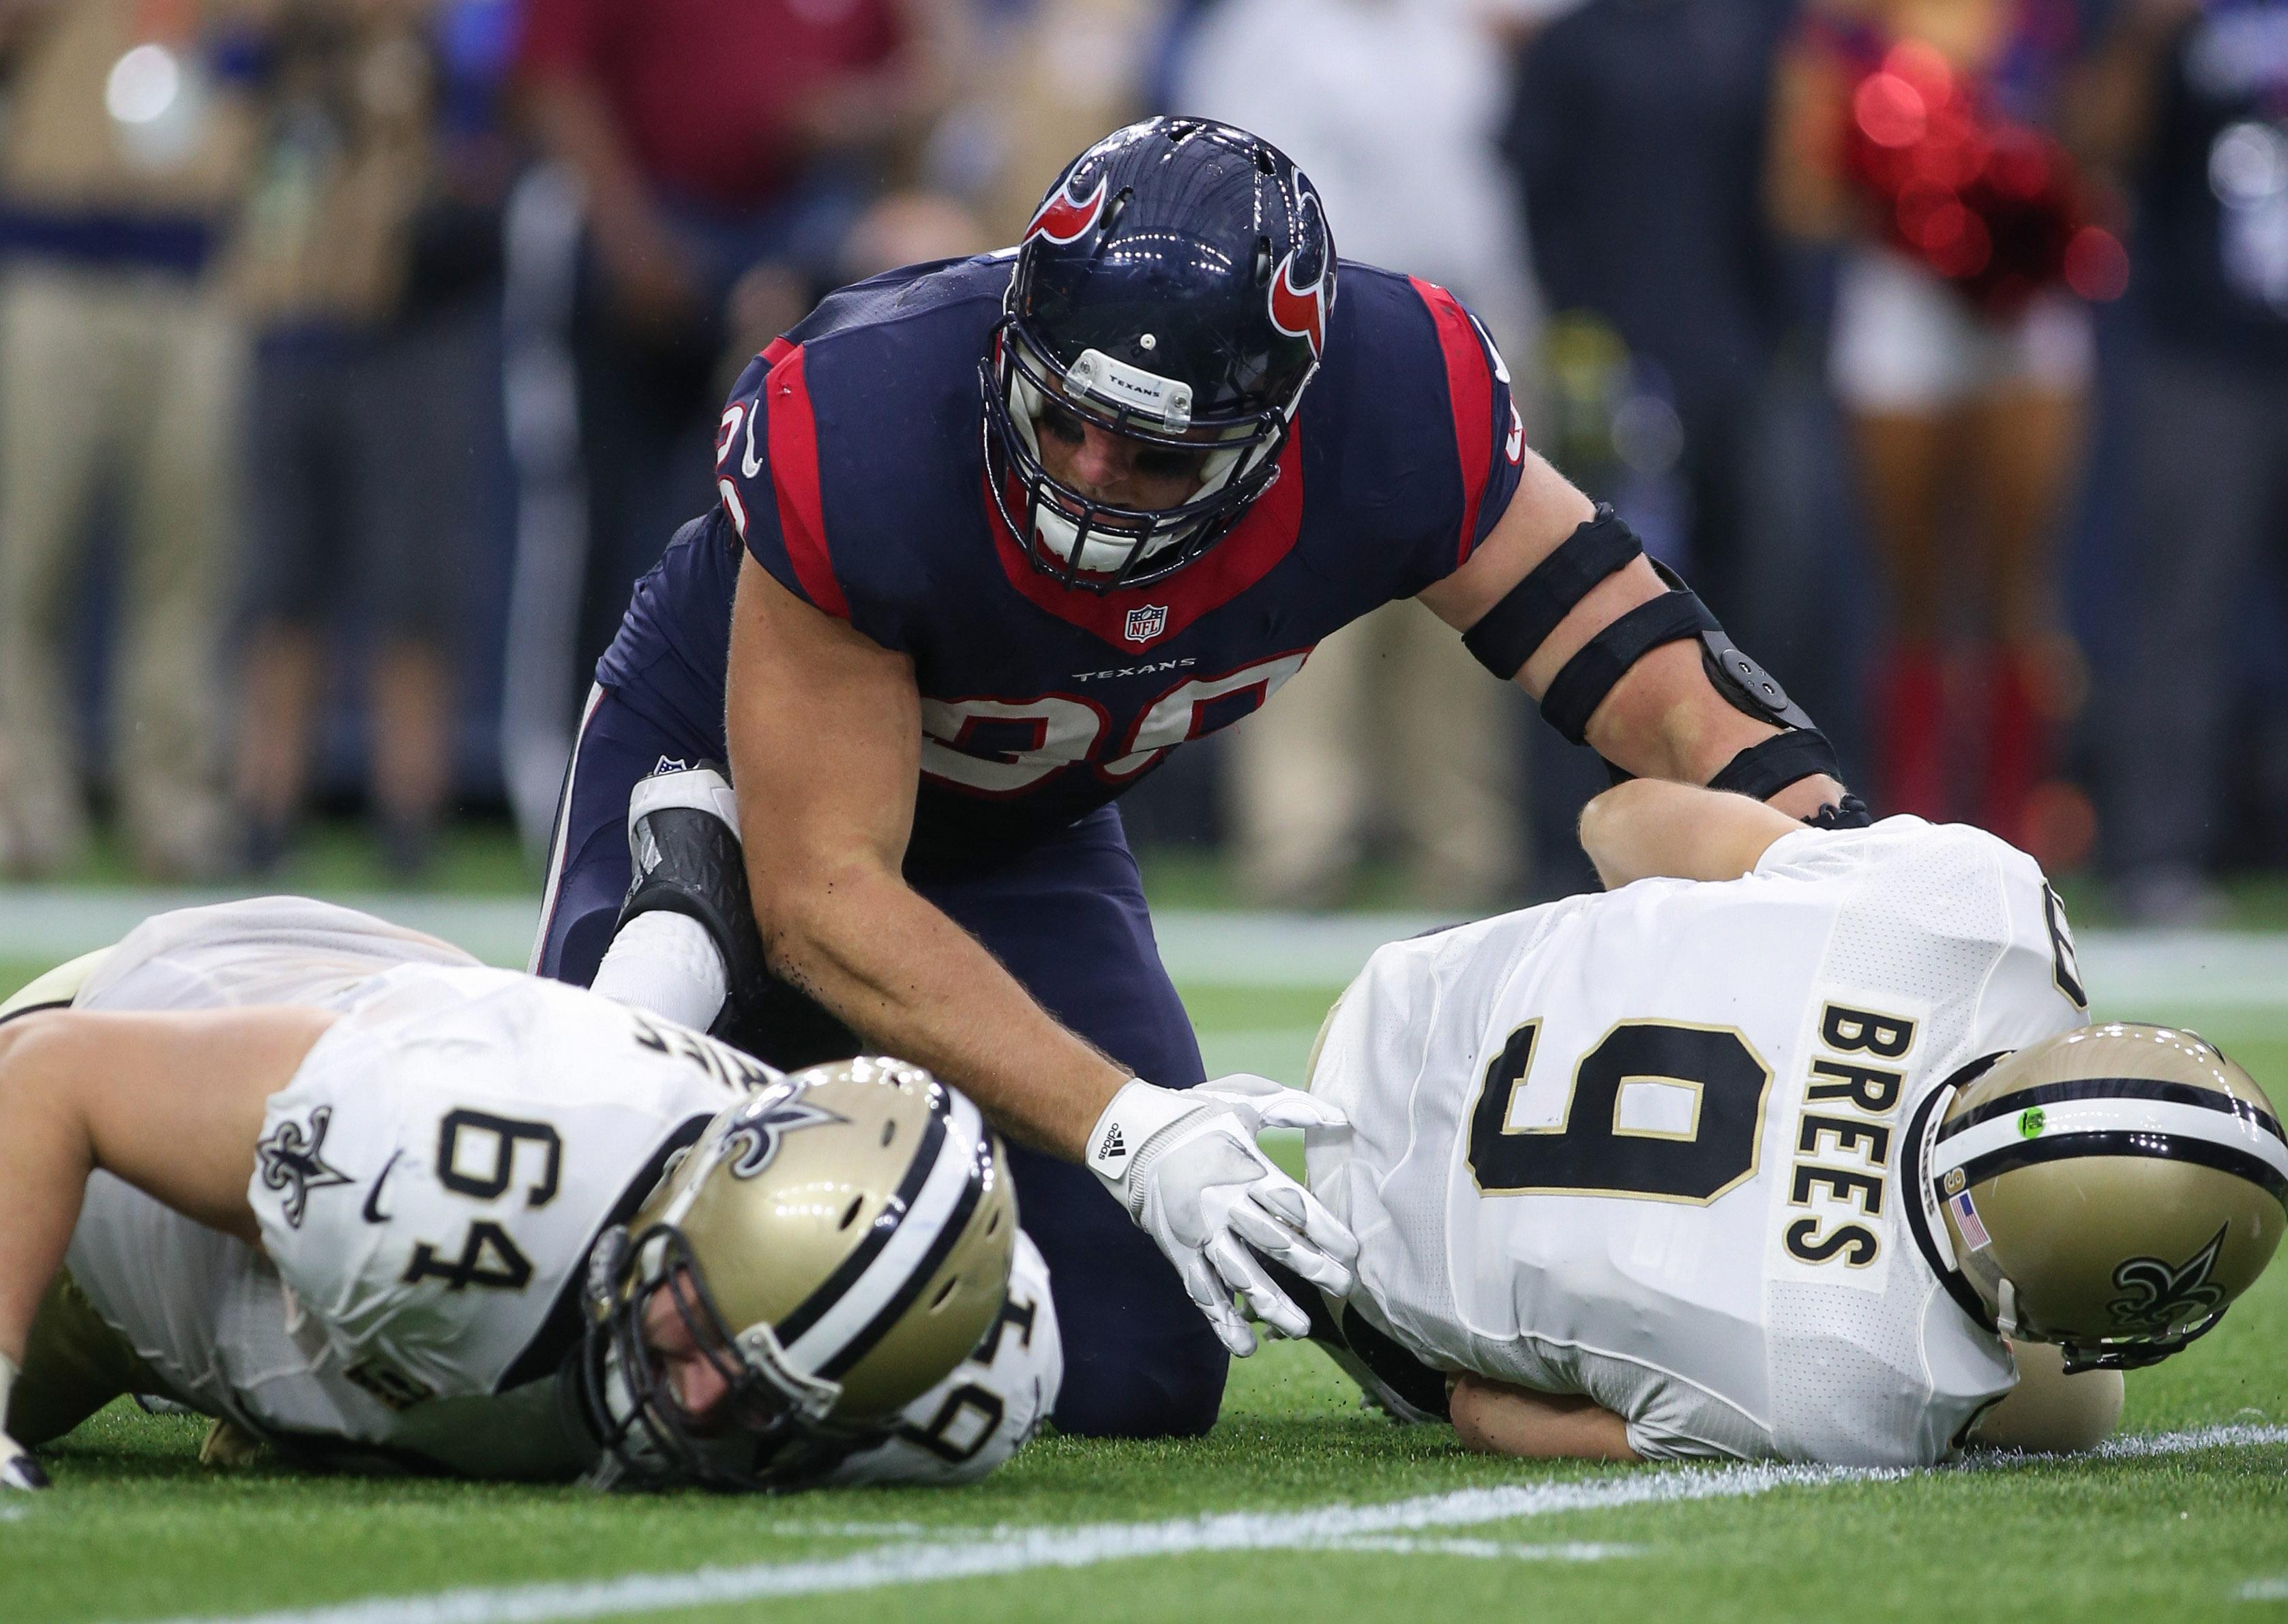 NFL: New Orleans Saints at Houston Texans